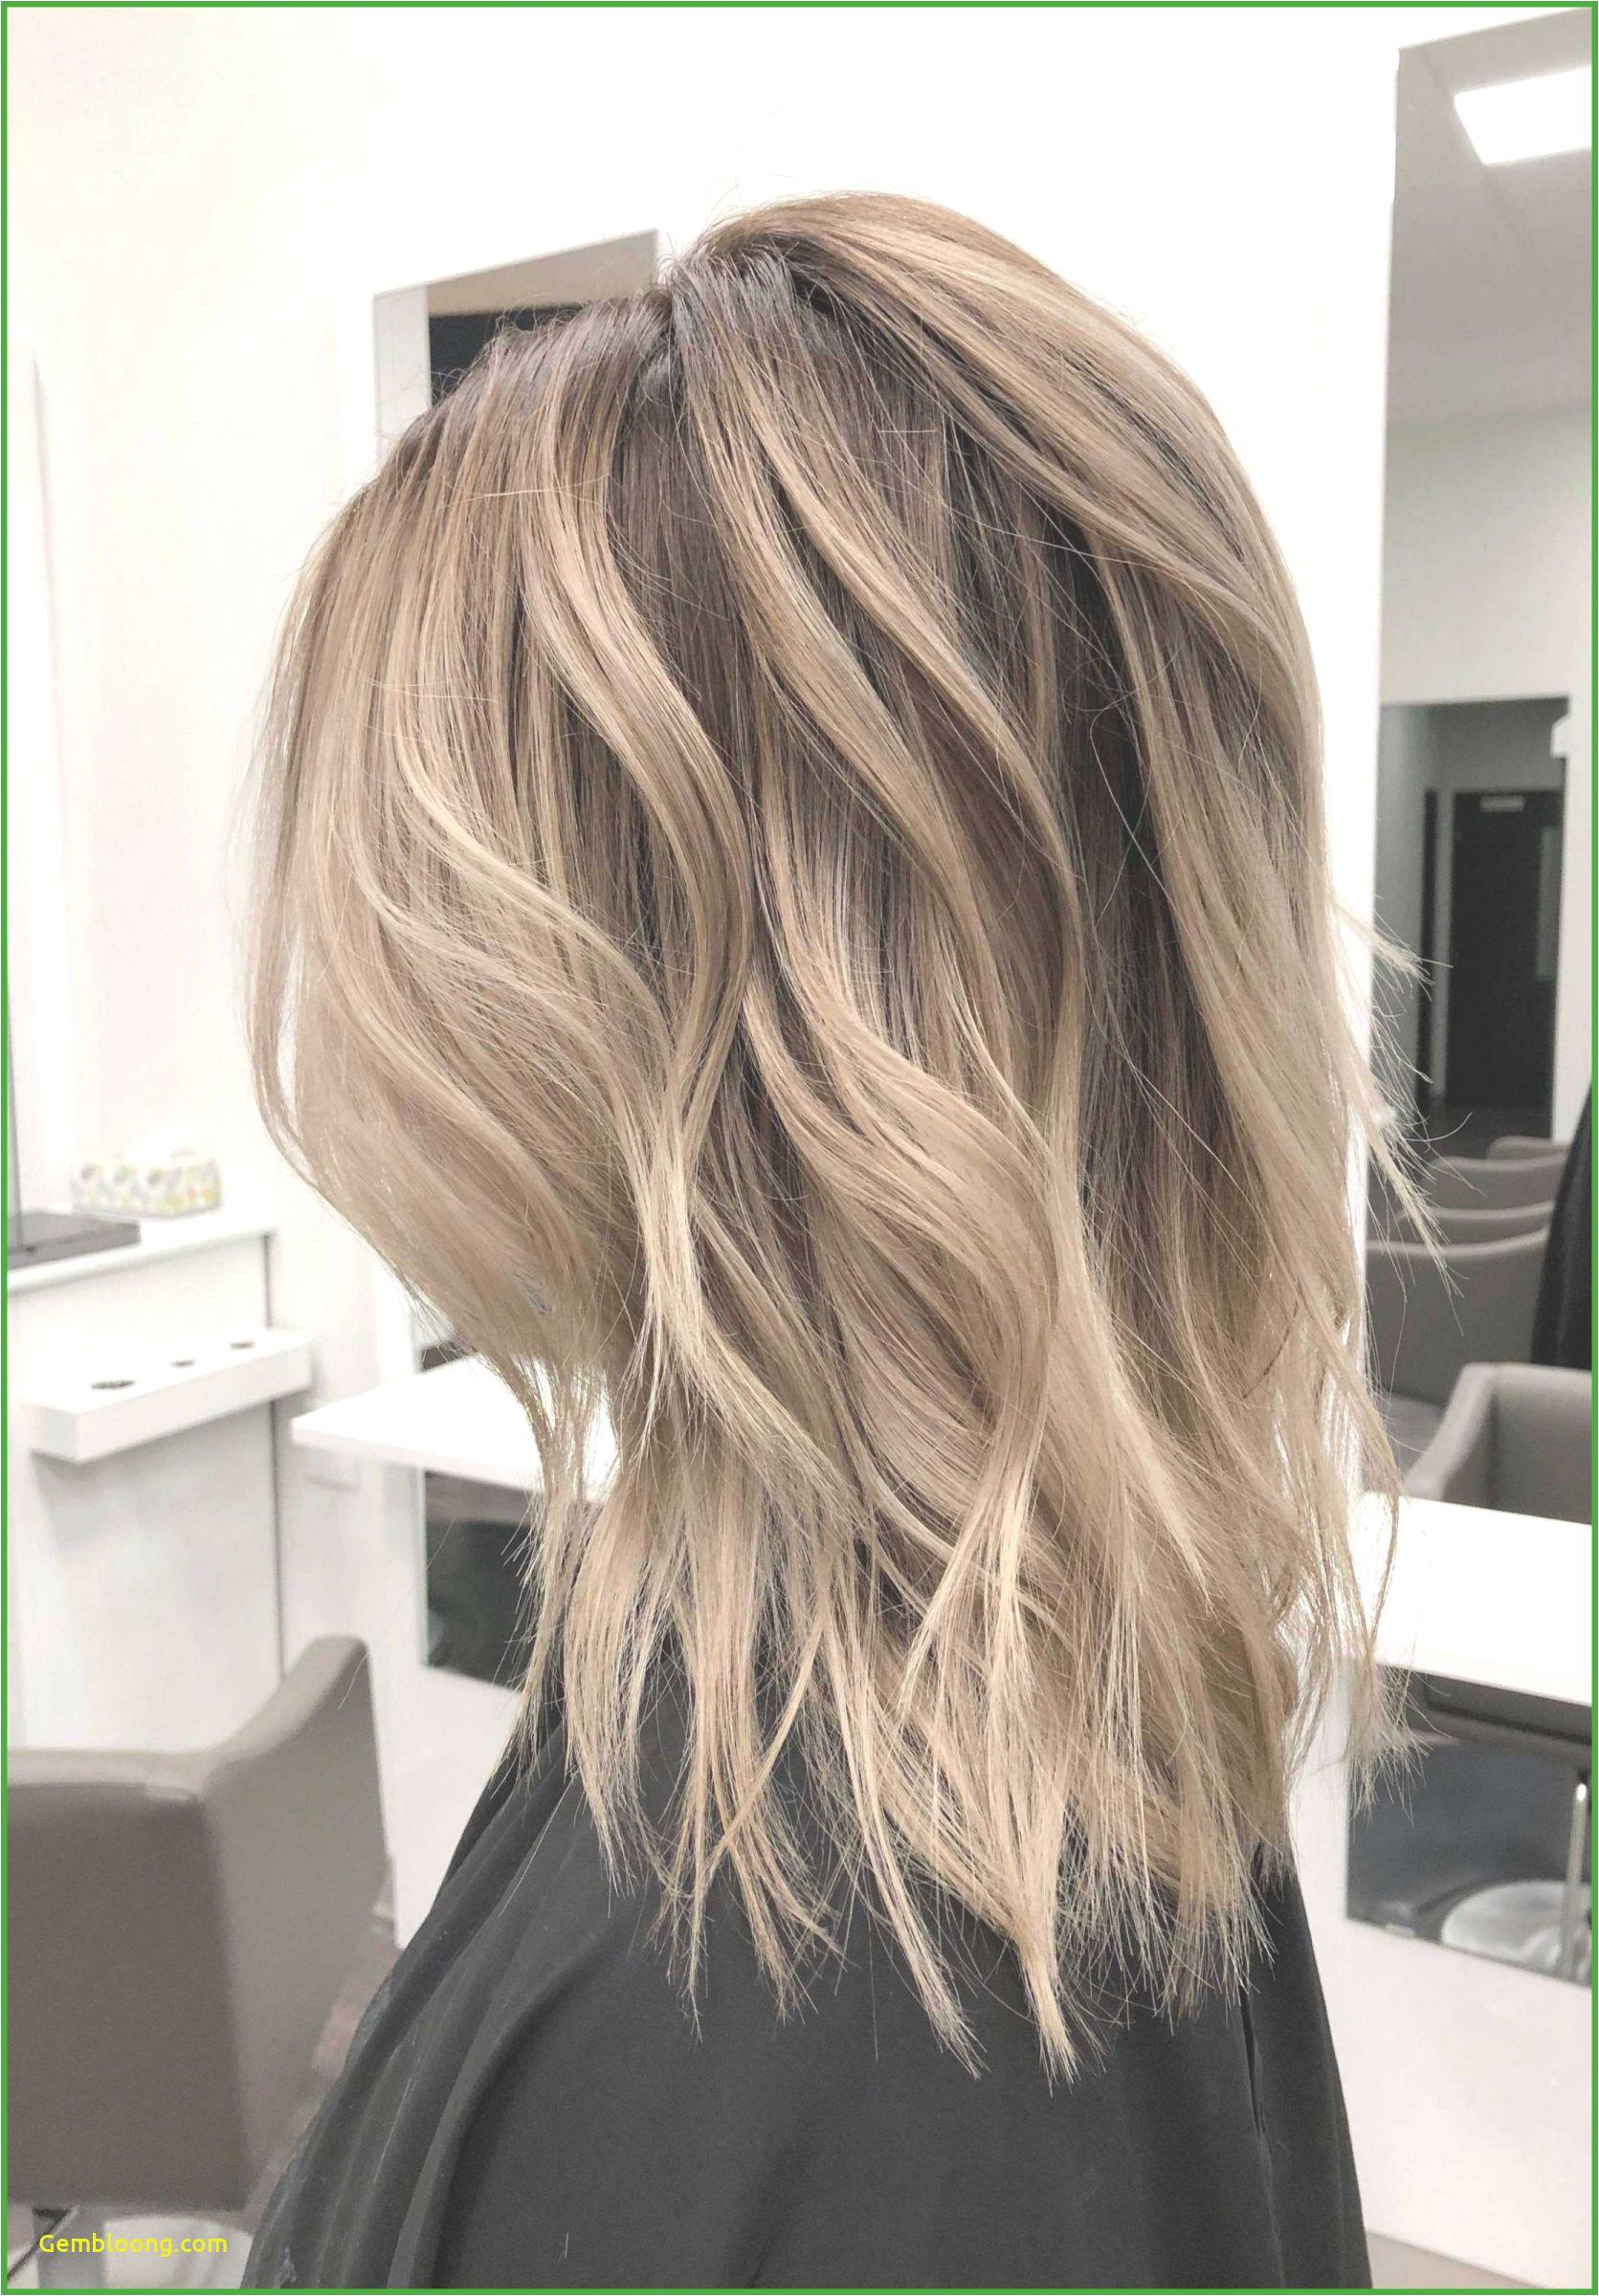 spirit of short layer cut hairstyle